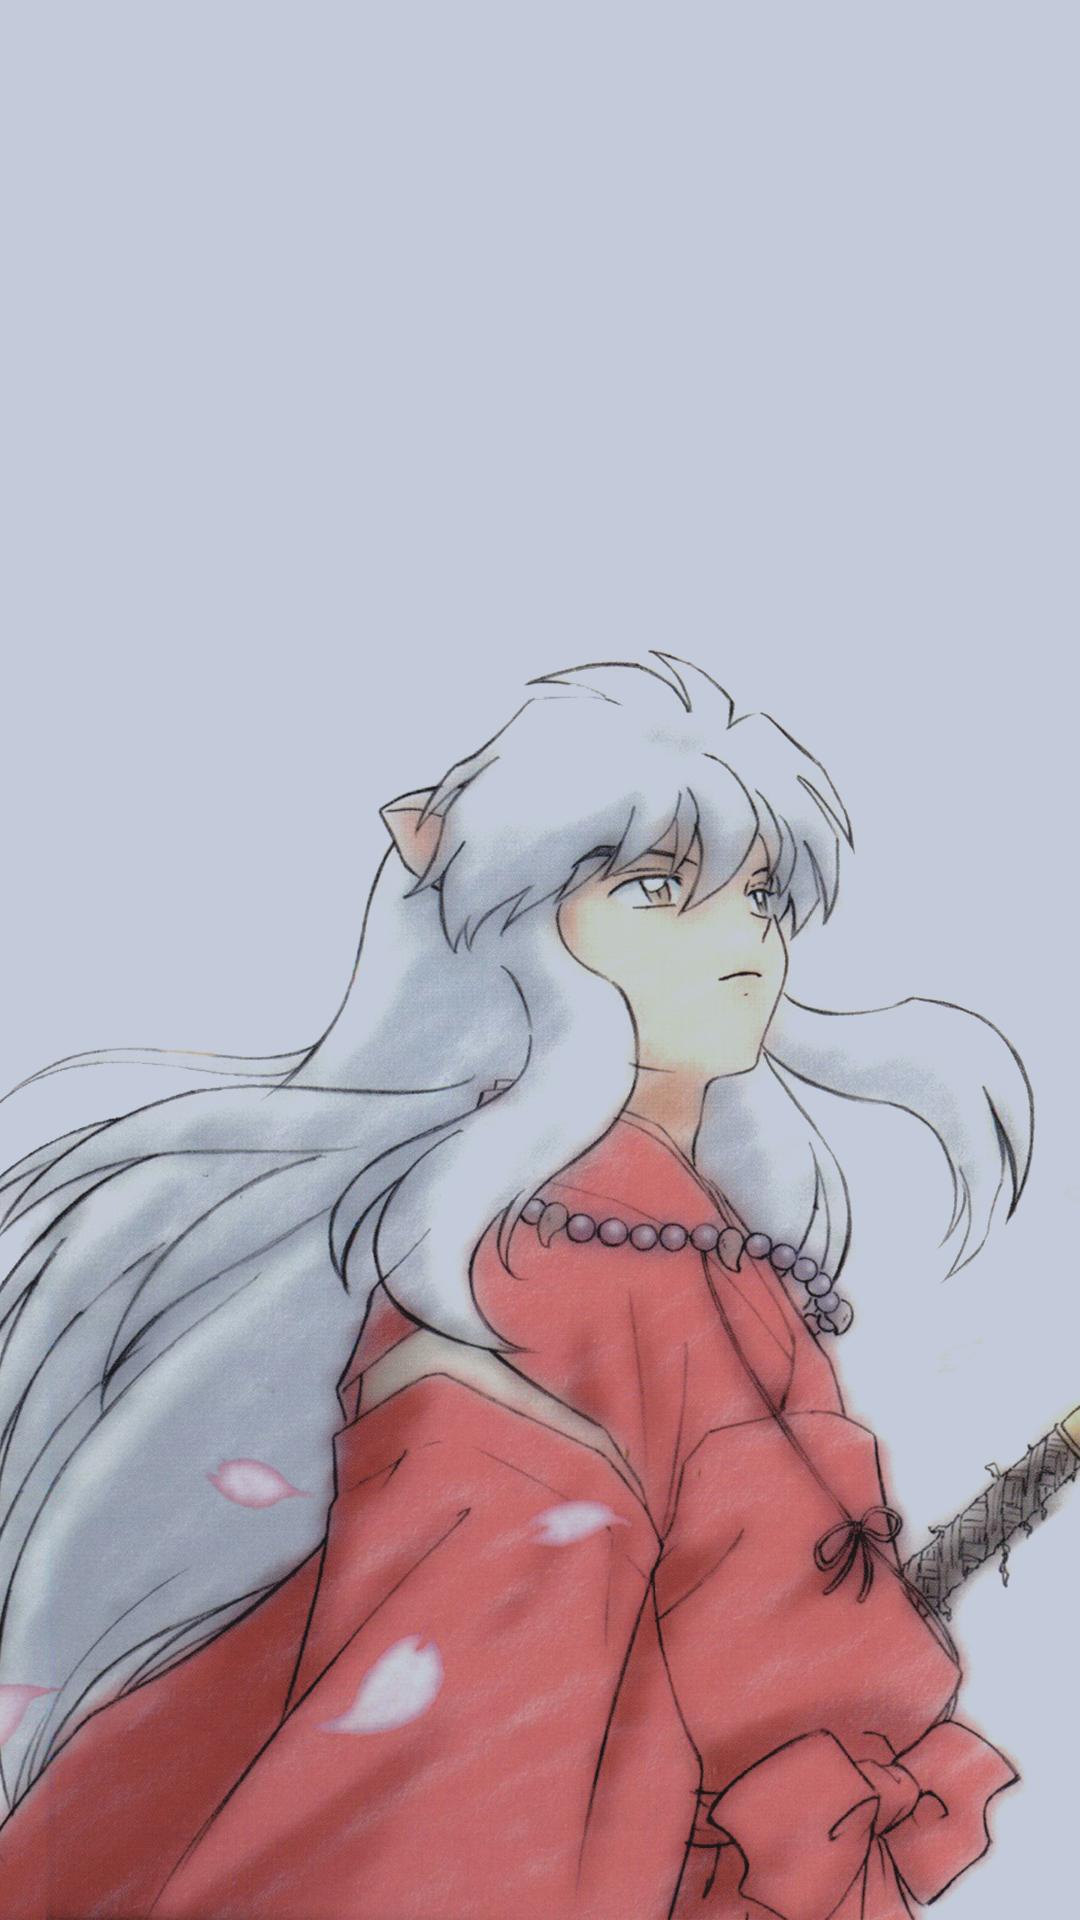 Ka8aros Inuyasha Phone Wallpapers 1080x1920 Requested Anime Inuyasha Fan Art Anime Wallpaper